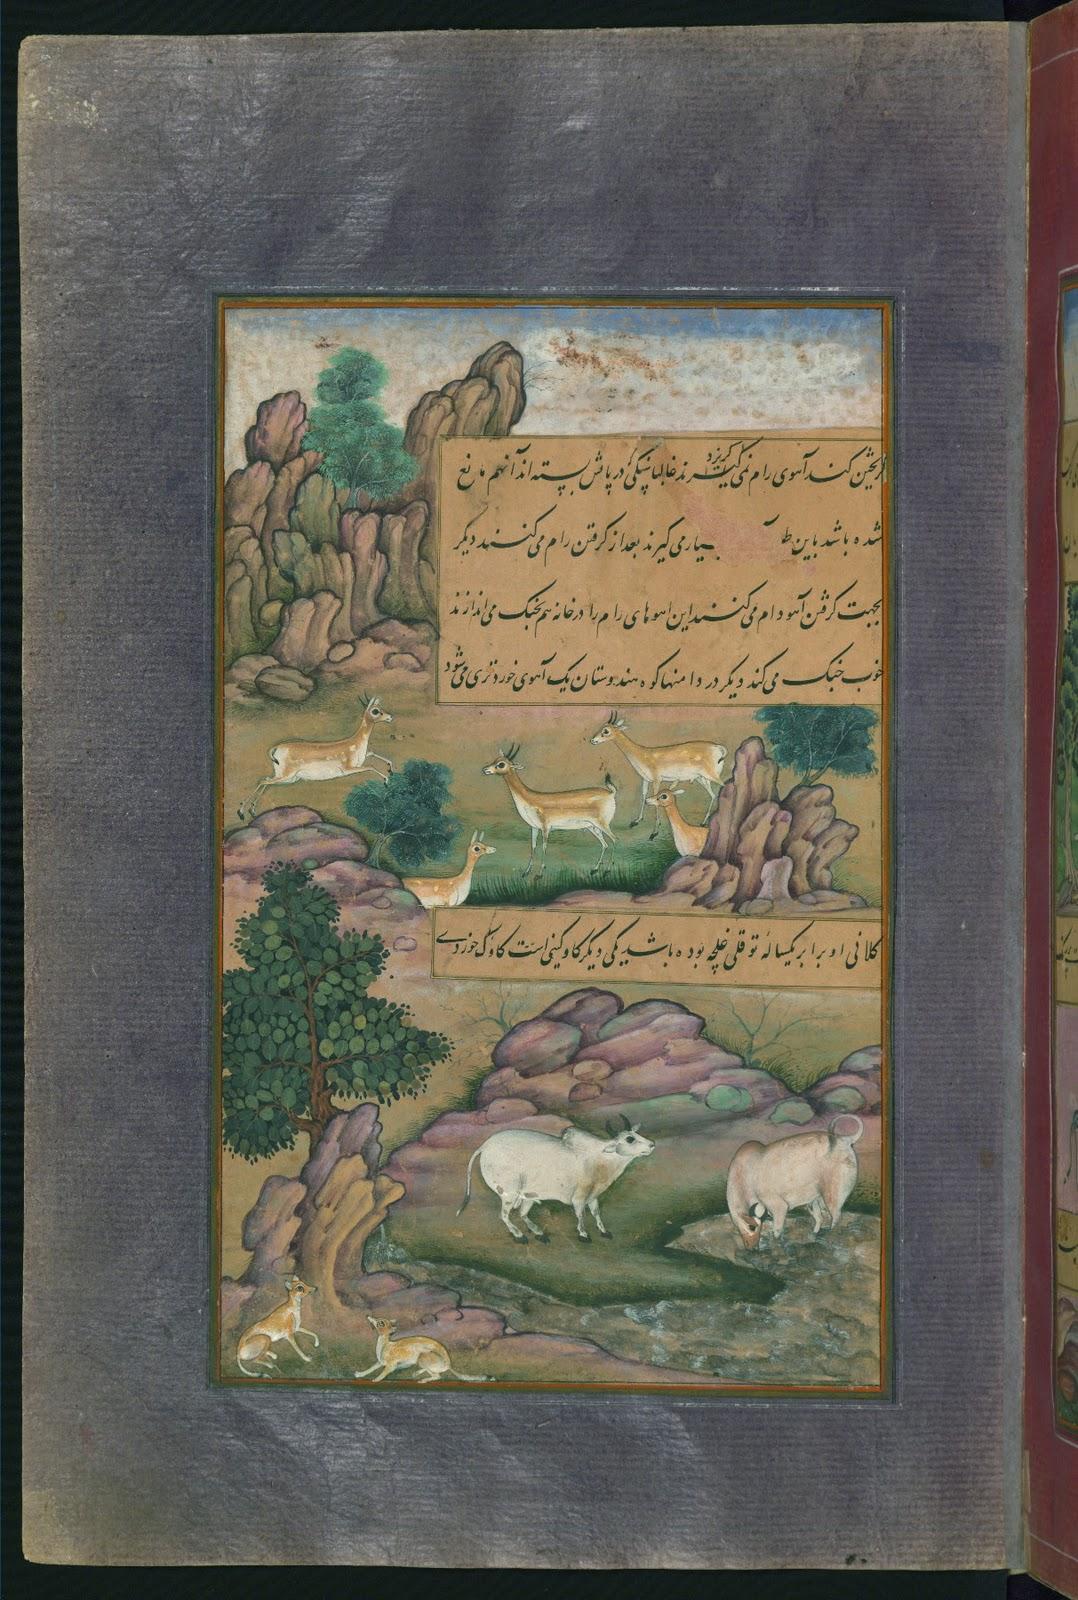 http://3.bp.blogspot.com/-sXzQ2y2U8HE/UDZfwt7ThvI/AAAAAAAADVY/2flQU41HF3c/s1600/Animals+of+Hindustan+small+deer+and+cows+called+g%C4%ABn%C4%AB,+from+Illuminated+manuscript+Baburnama+(Memoirs+of+Babur).jpg